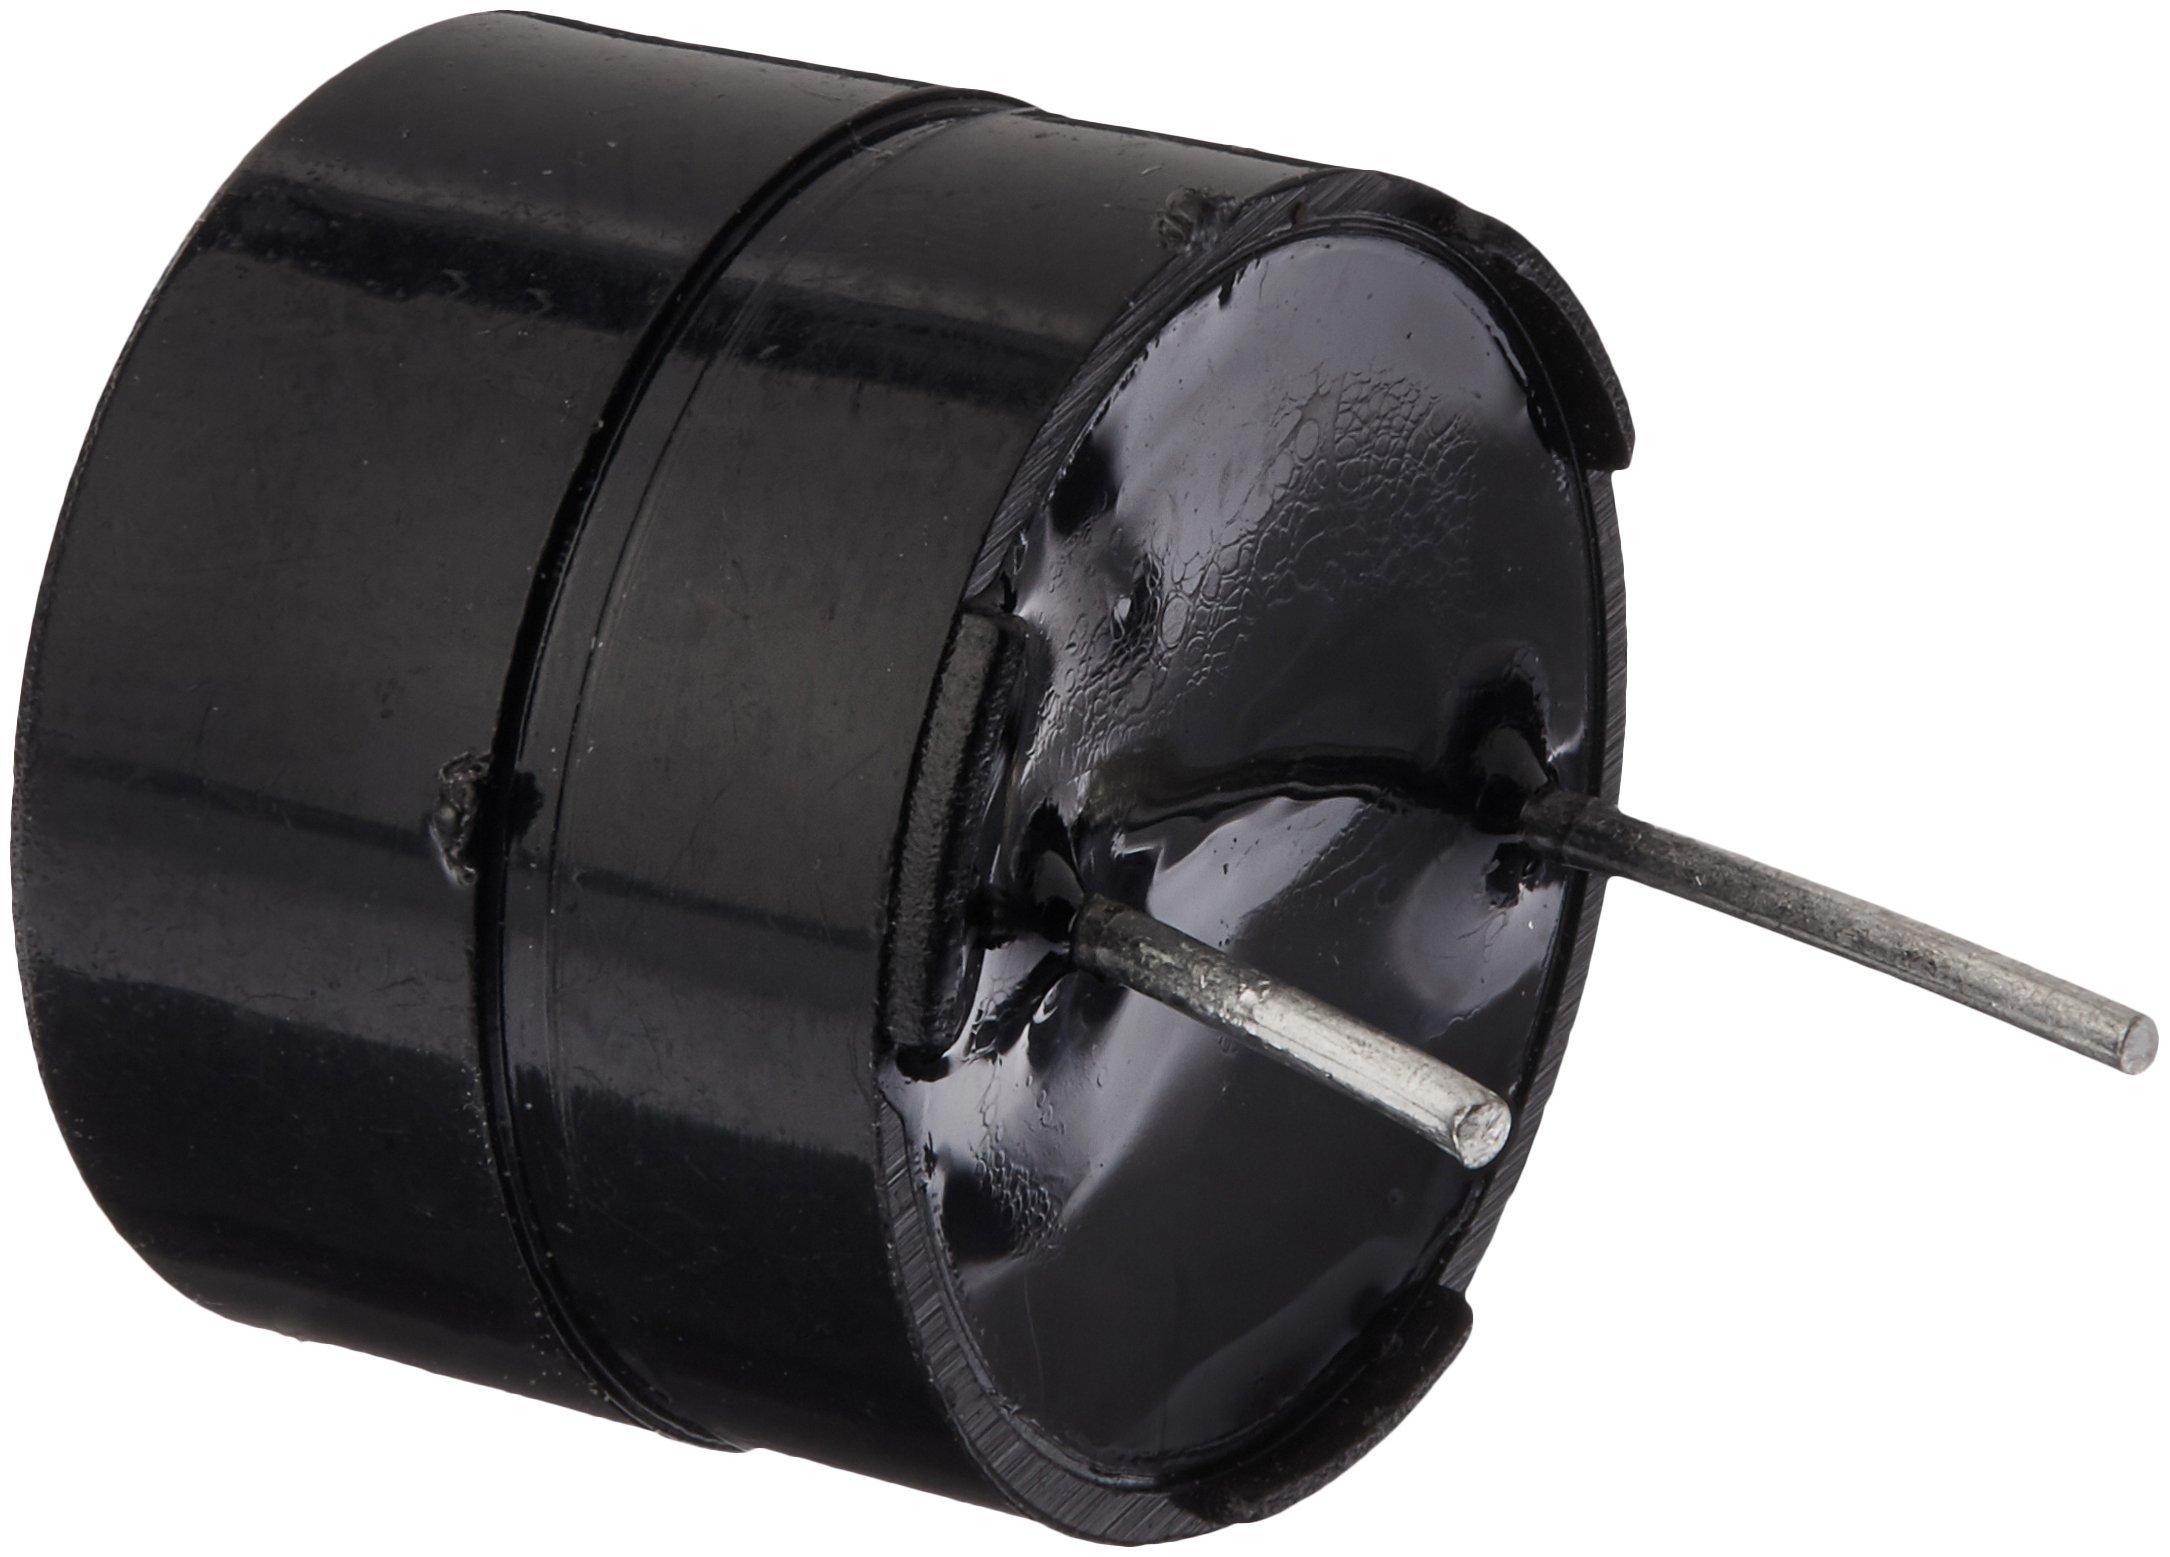 Uxcell a12081600ux0477 12 mm Diameter 5 Piece DC 5V 2 Terminals Electronic Continuous Sound Buzzer